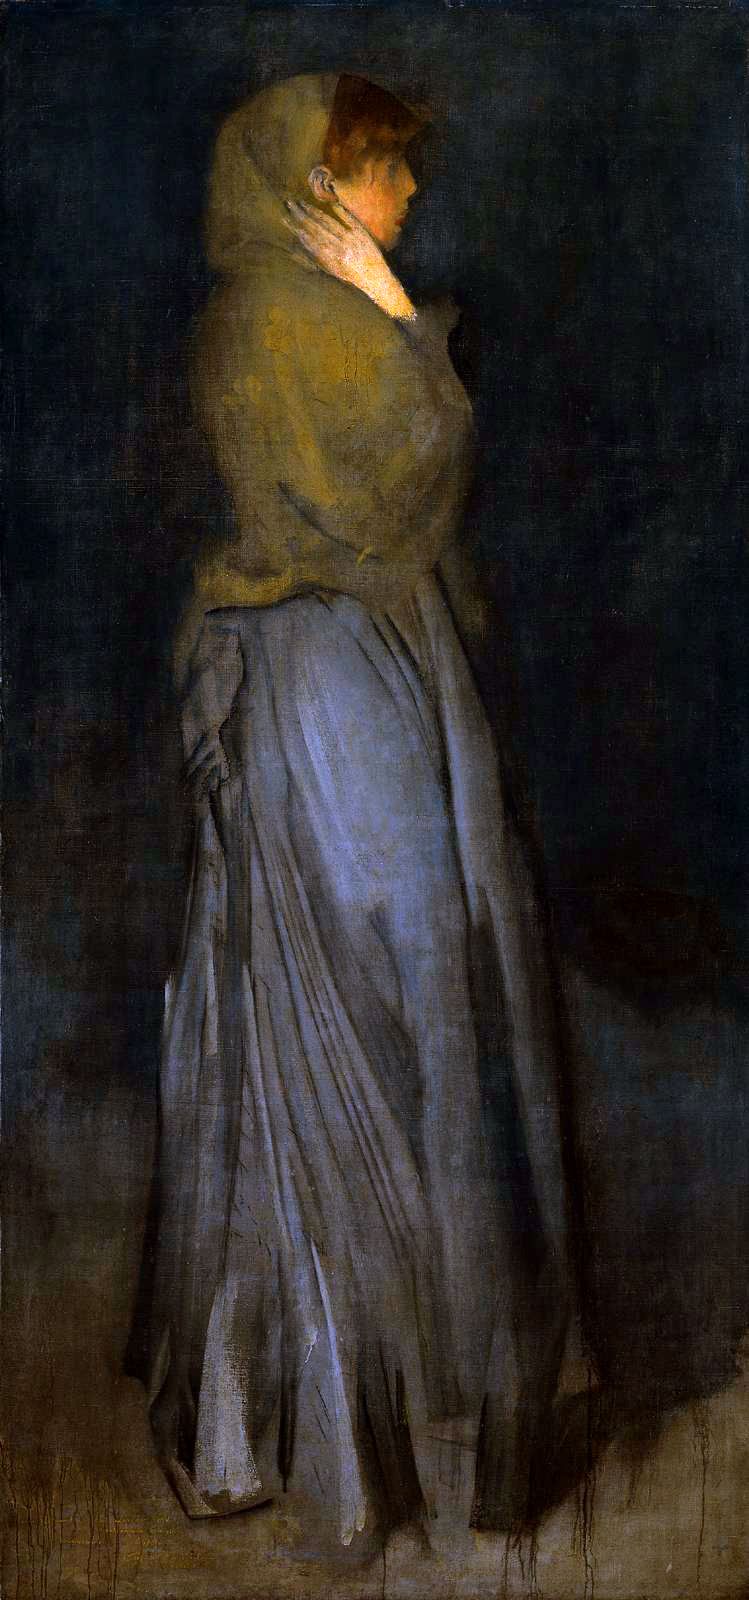 James Abbot McNeill Whistler. Arrangement in yellow and grey: EFFIE deans